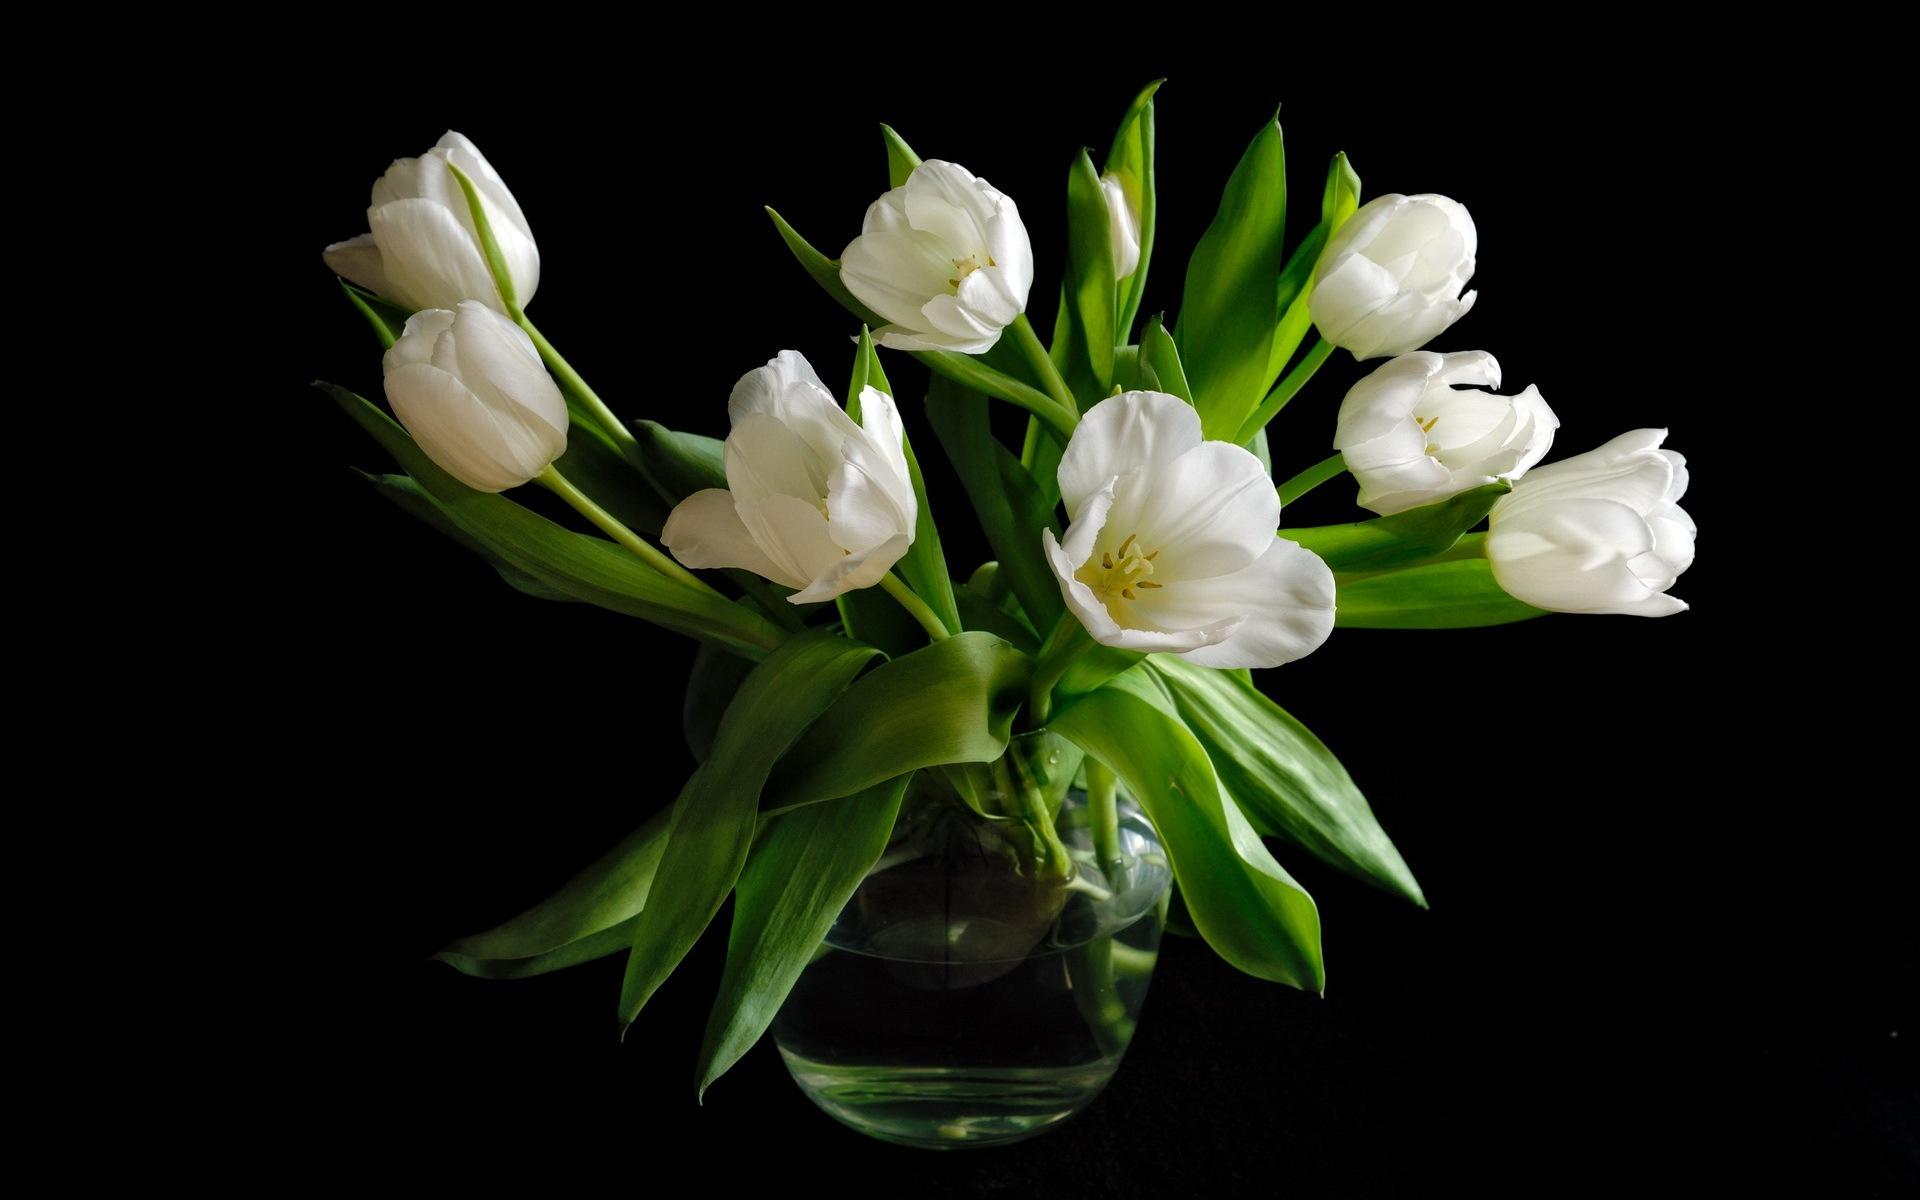 Wallpaper Vase White Tulip Flowers Black Background 1920x1200 Hd